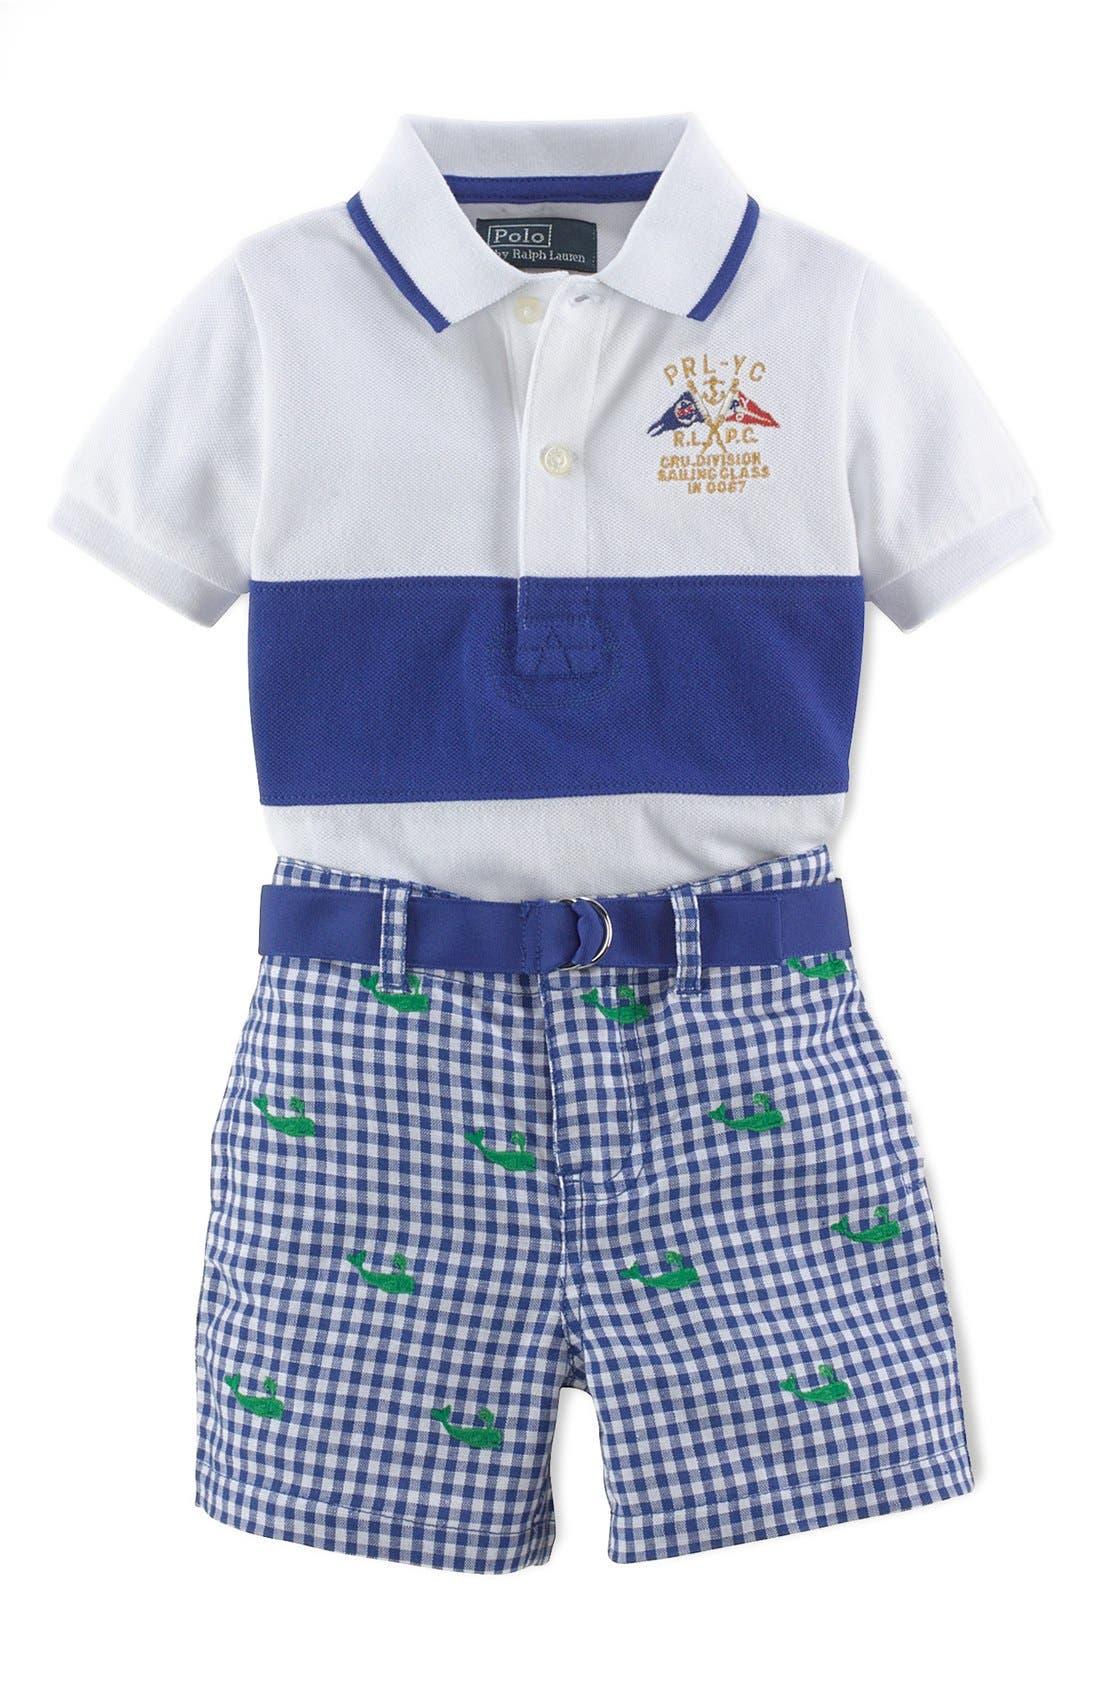 Alternate Image 1 Selected - Ralph Lauren Polo & Shorts (Baby Boys)